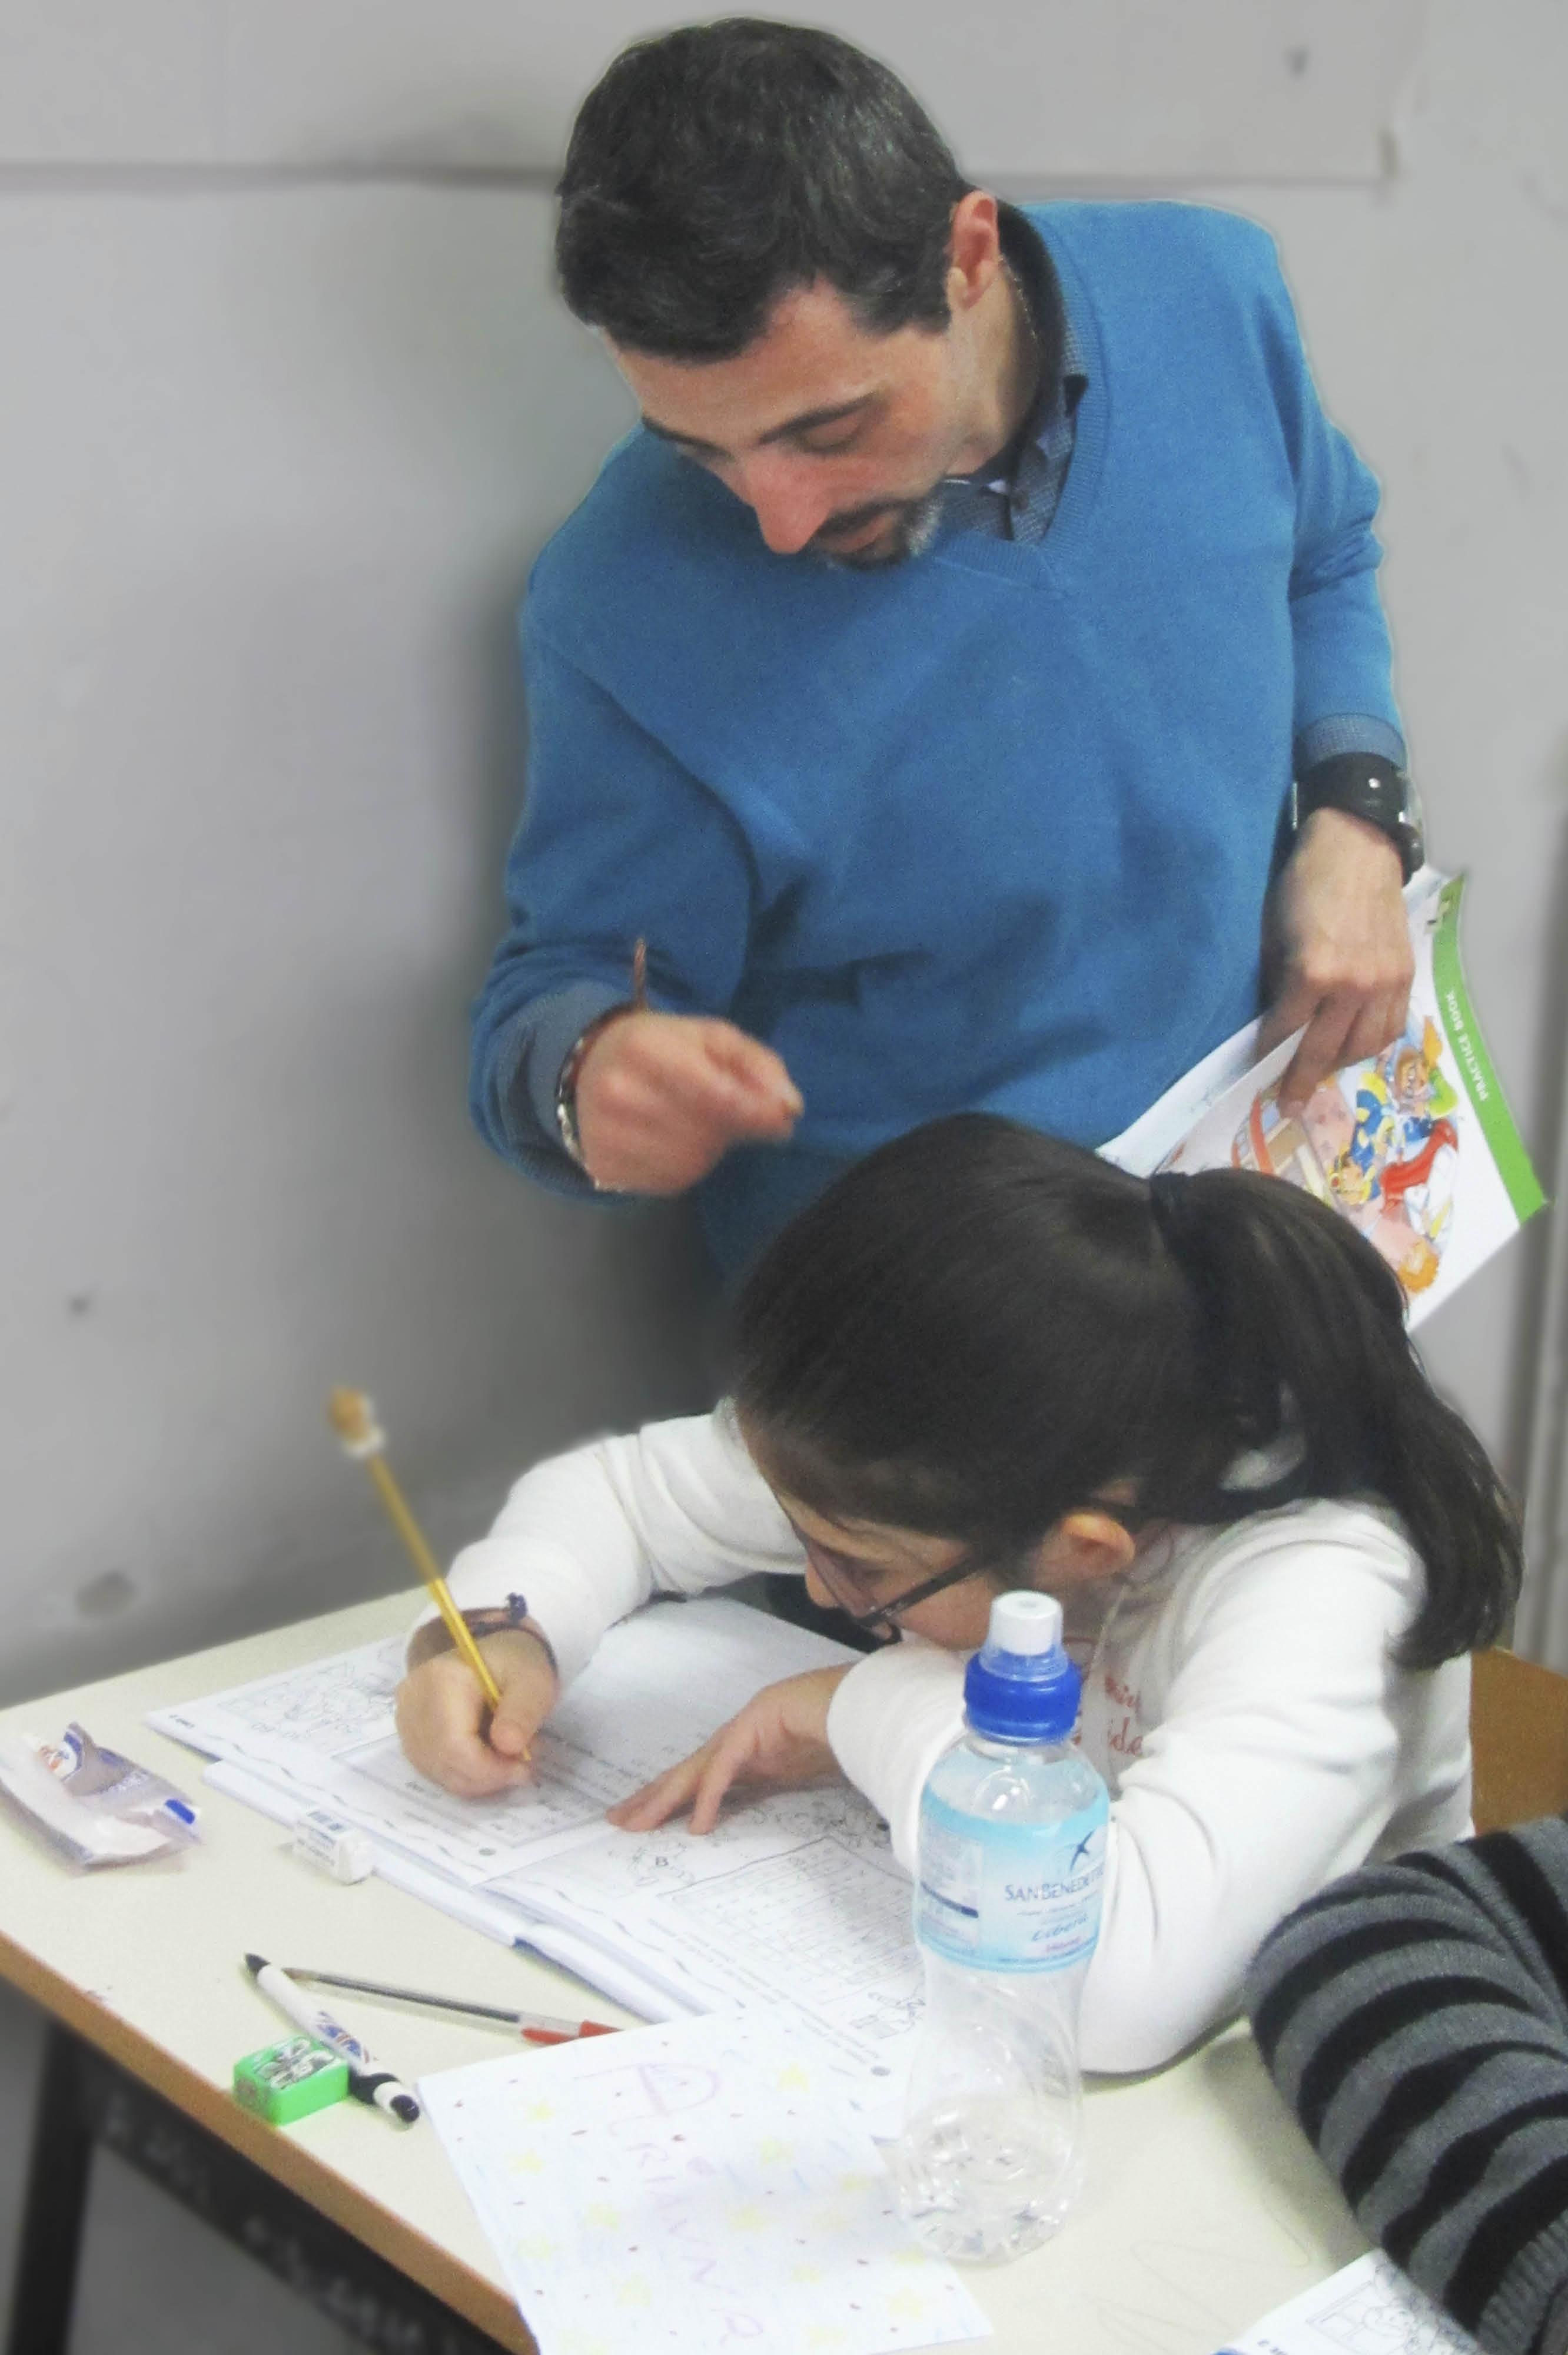 Benedict School Pomigliano d'Arco @ Somma8